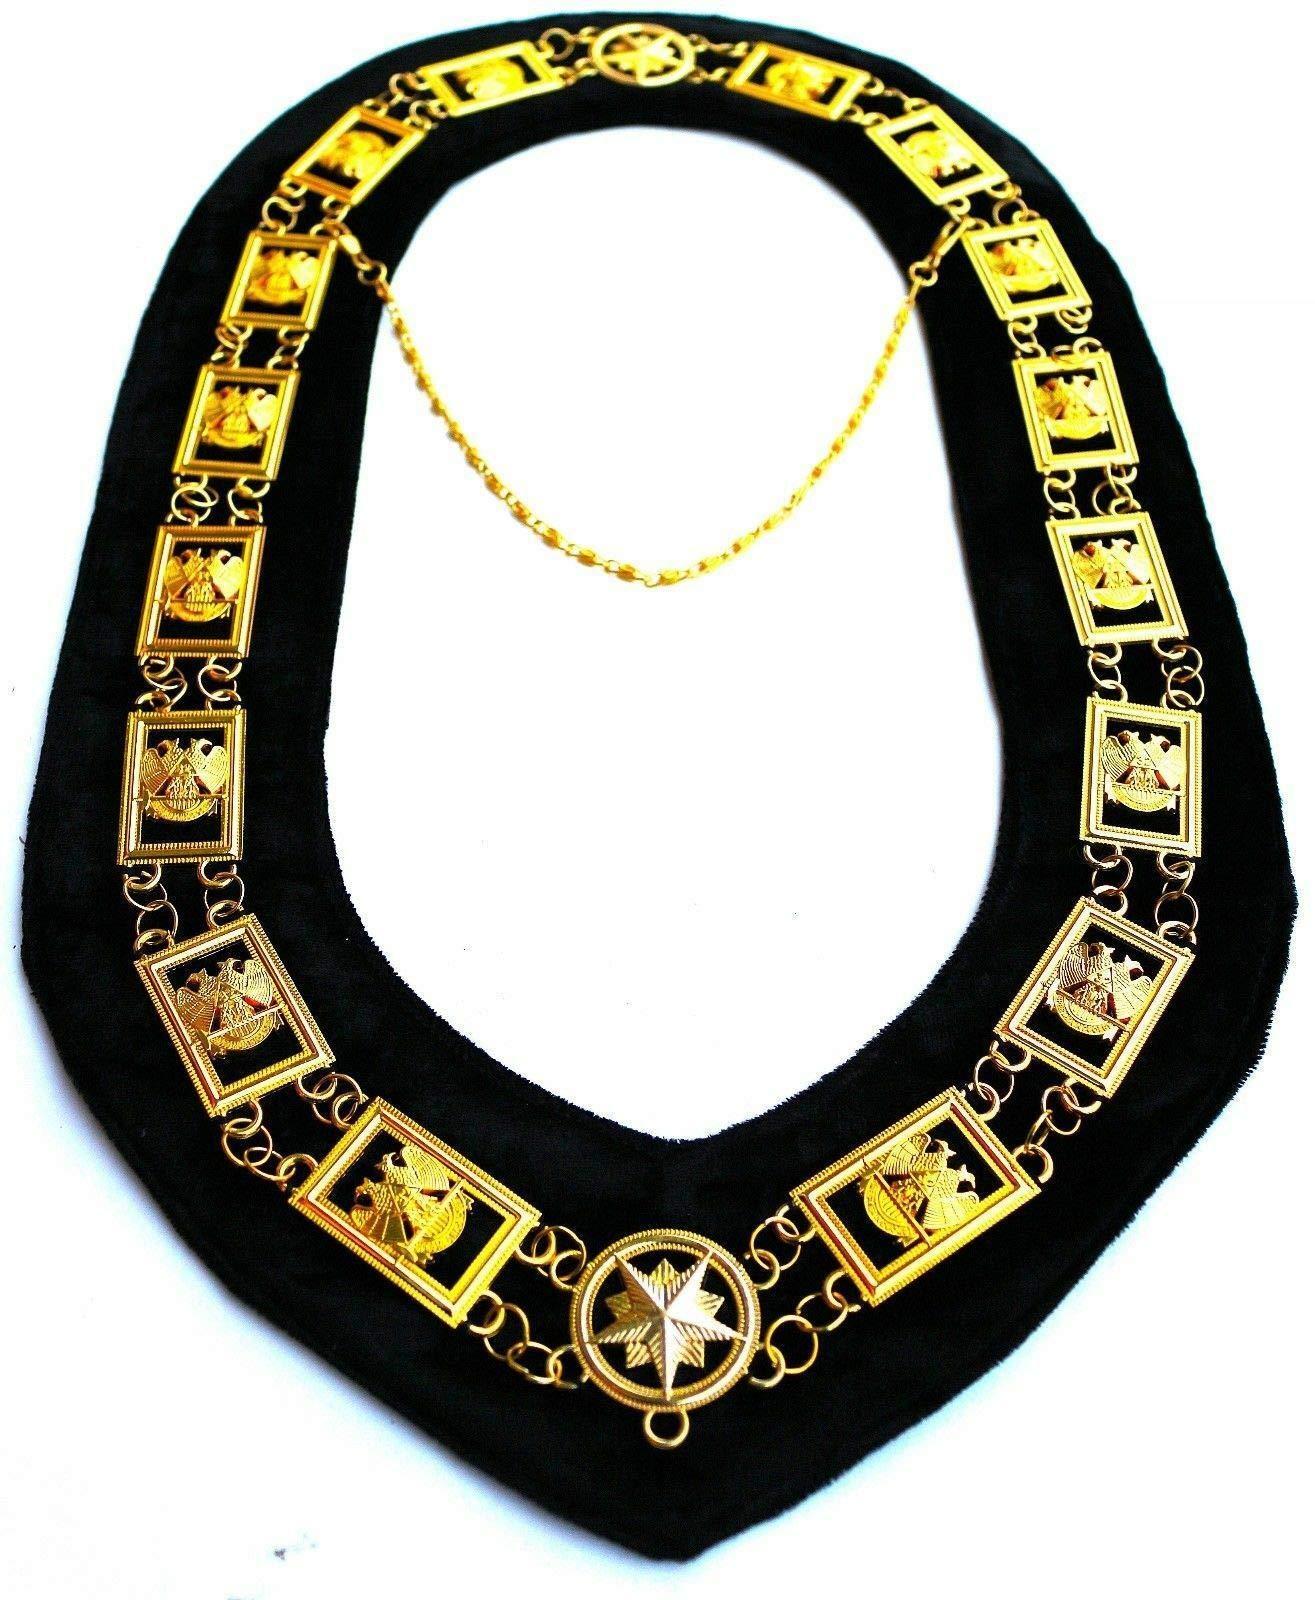 Masonic Collar 32 32ND Degree Wings Down Scottish Rite Gold Plated // Black Backing DMR-1200GBK